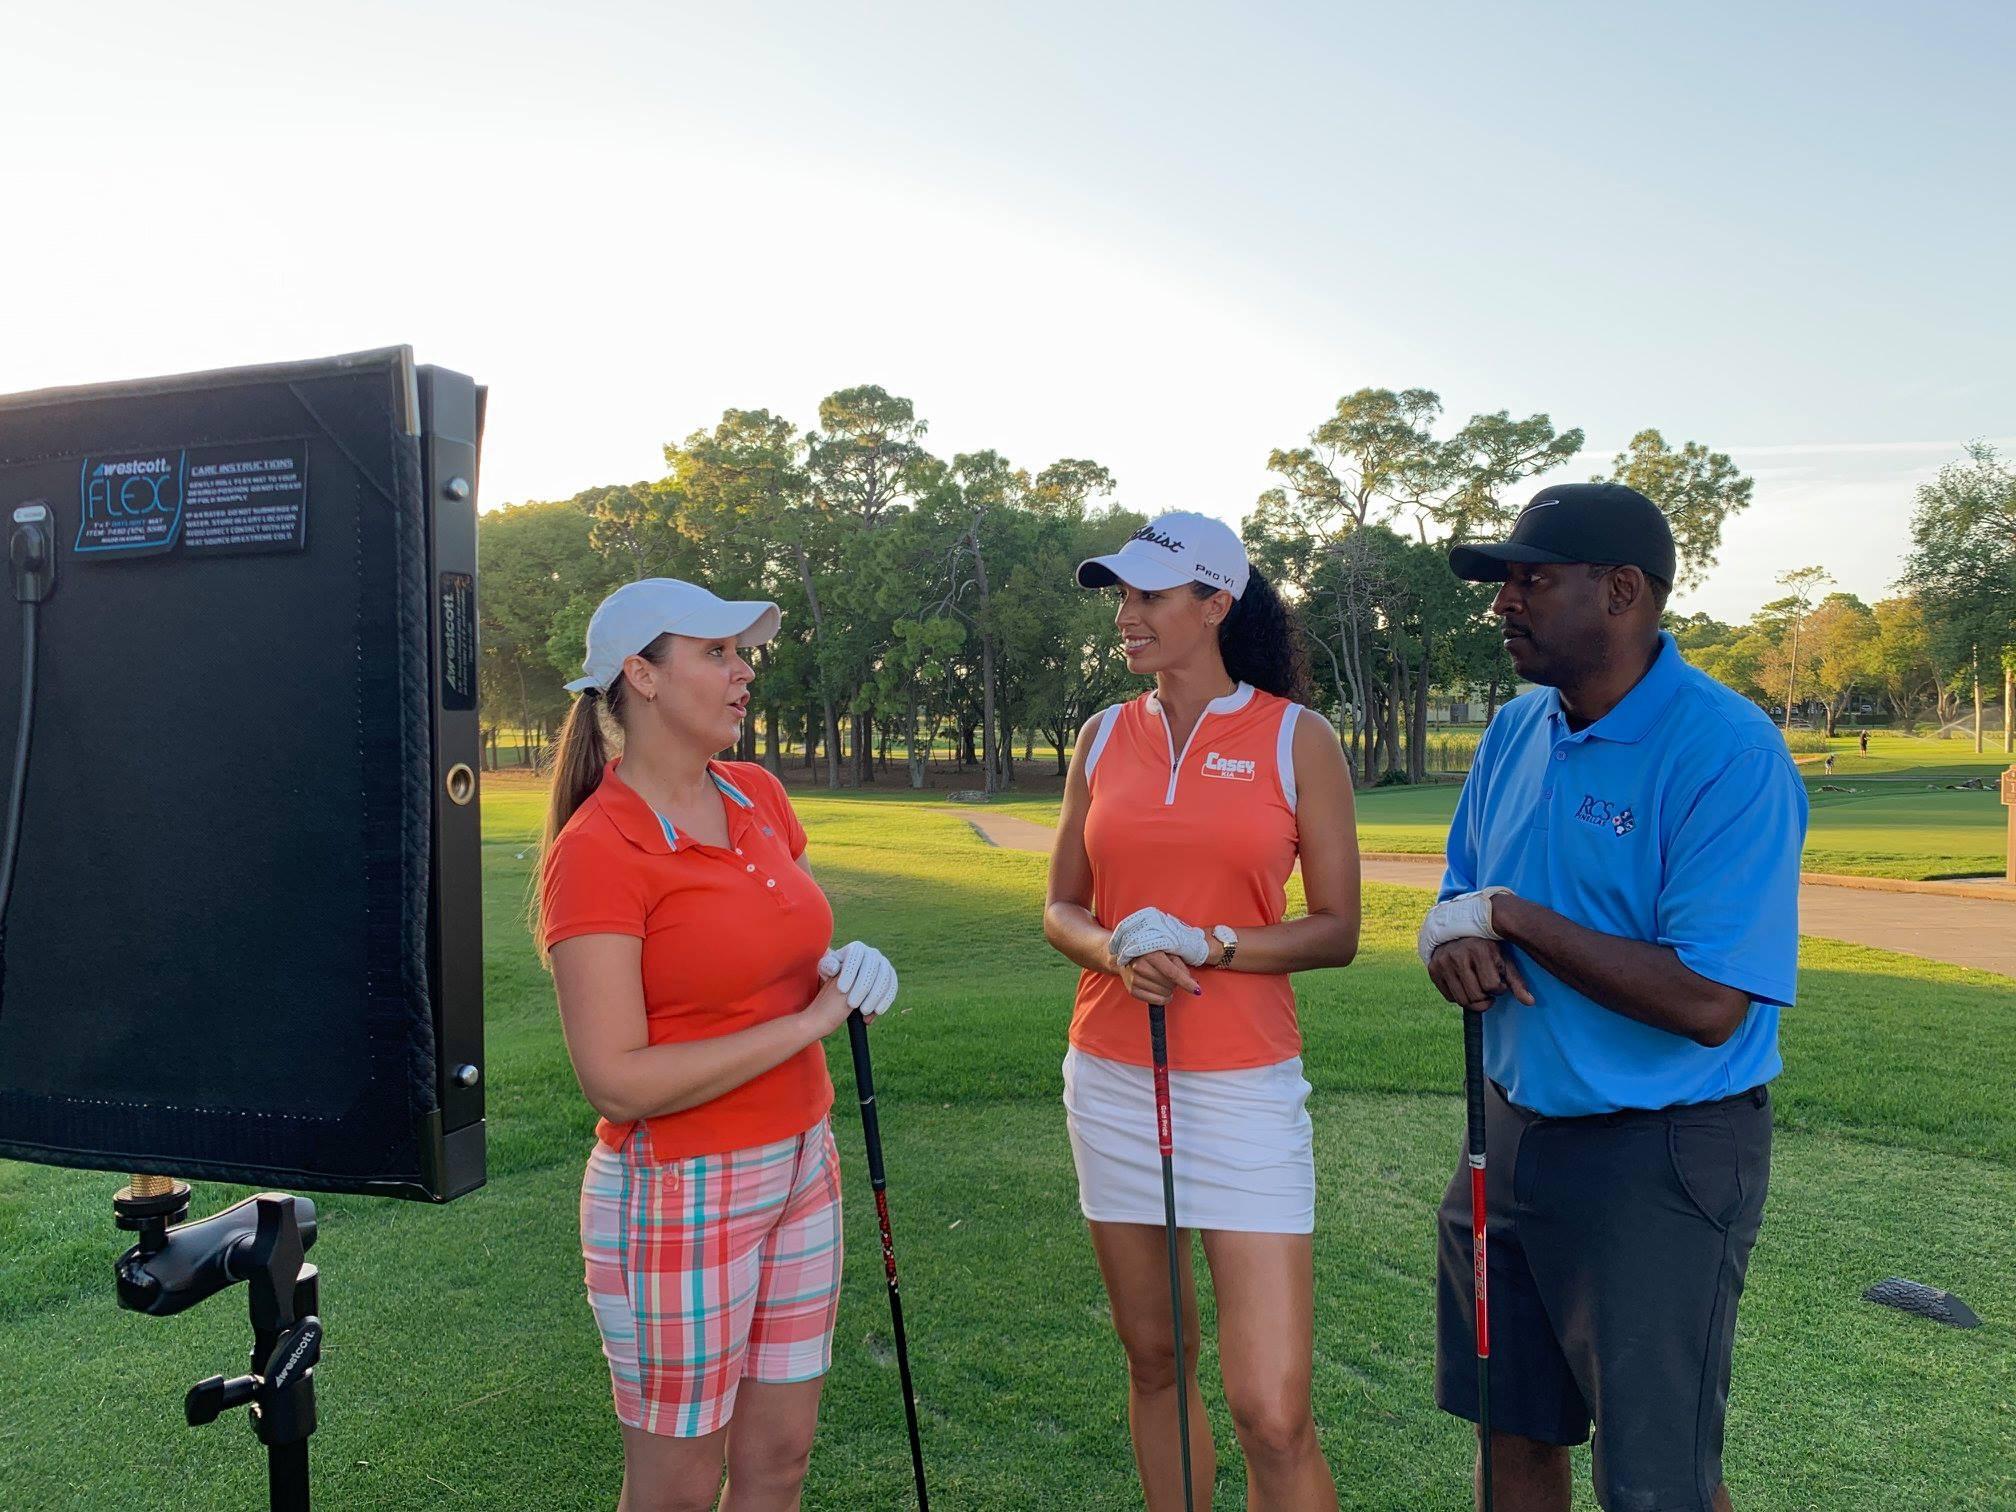 RCS PinellasCelebrity Golf ClassicCommercial Shoot -